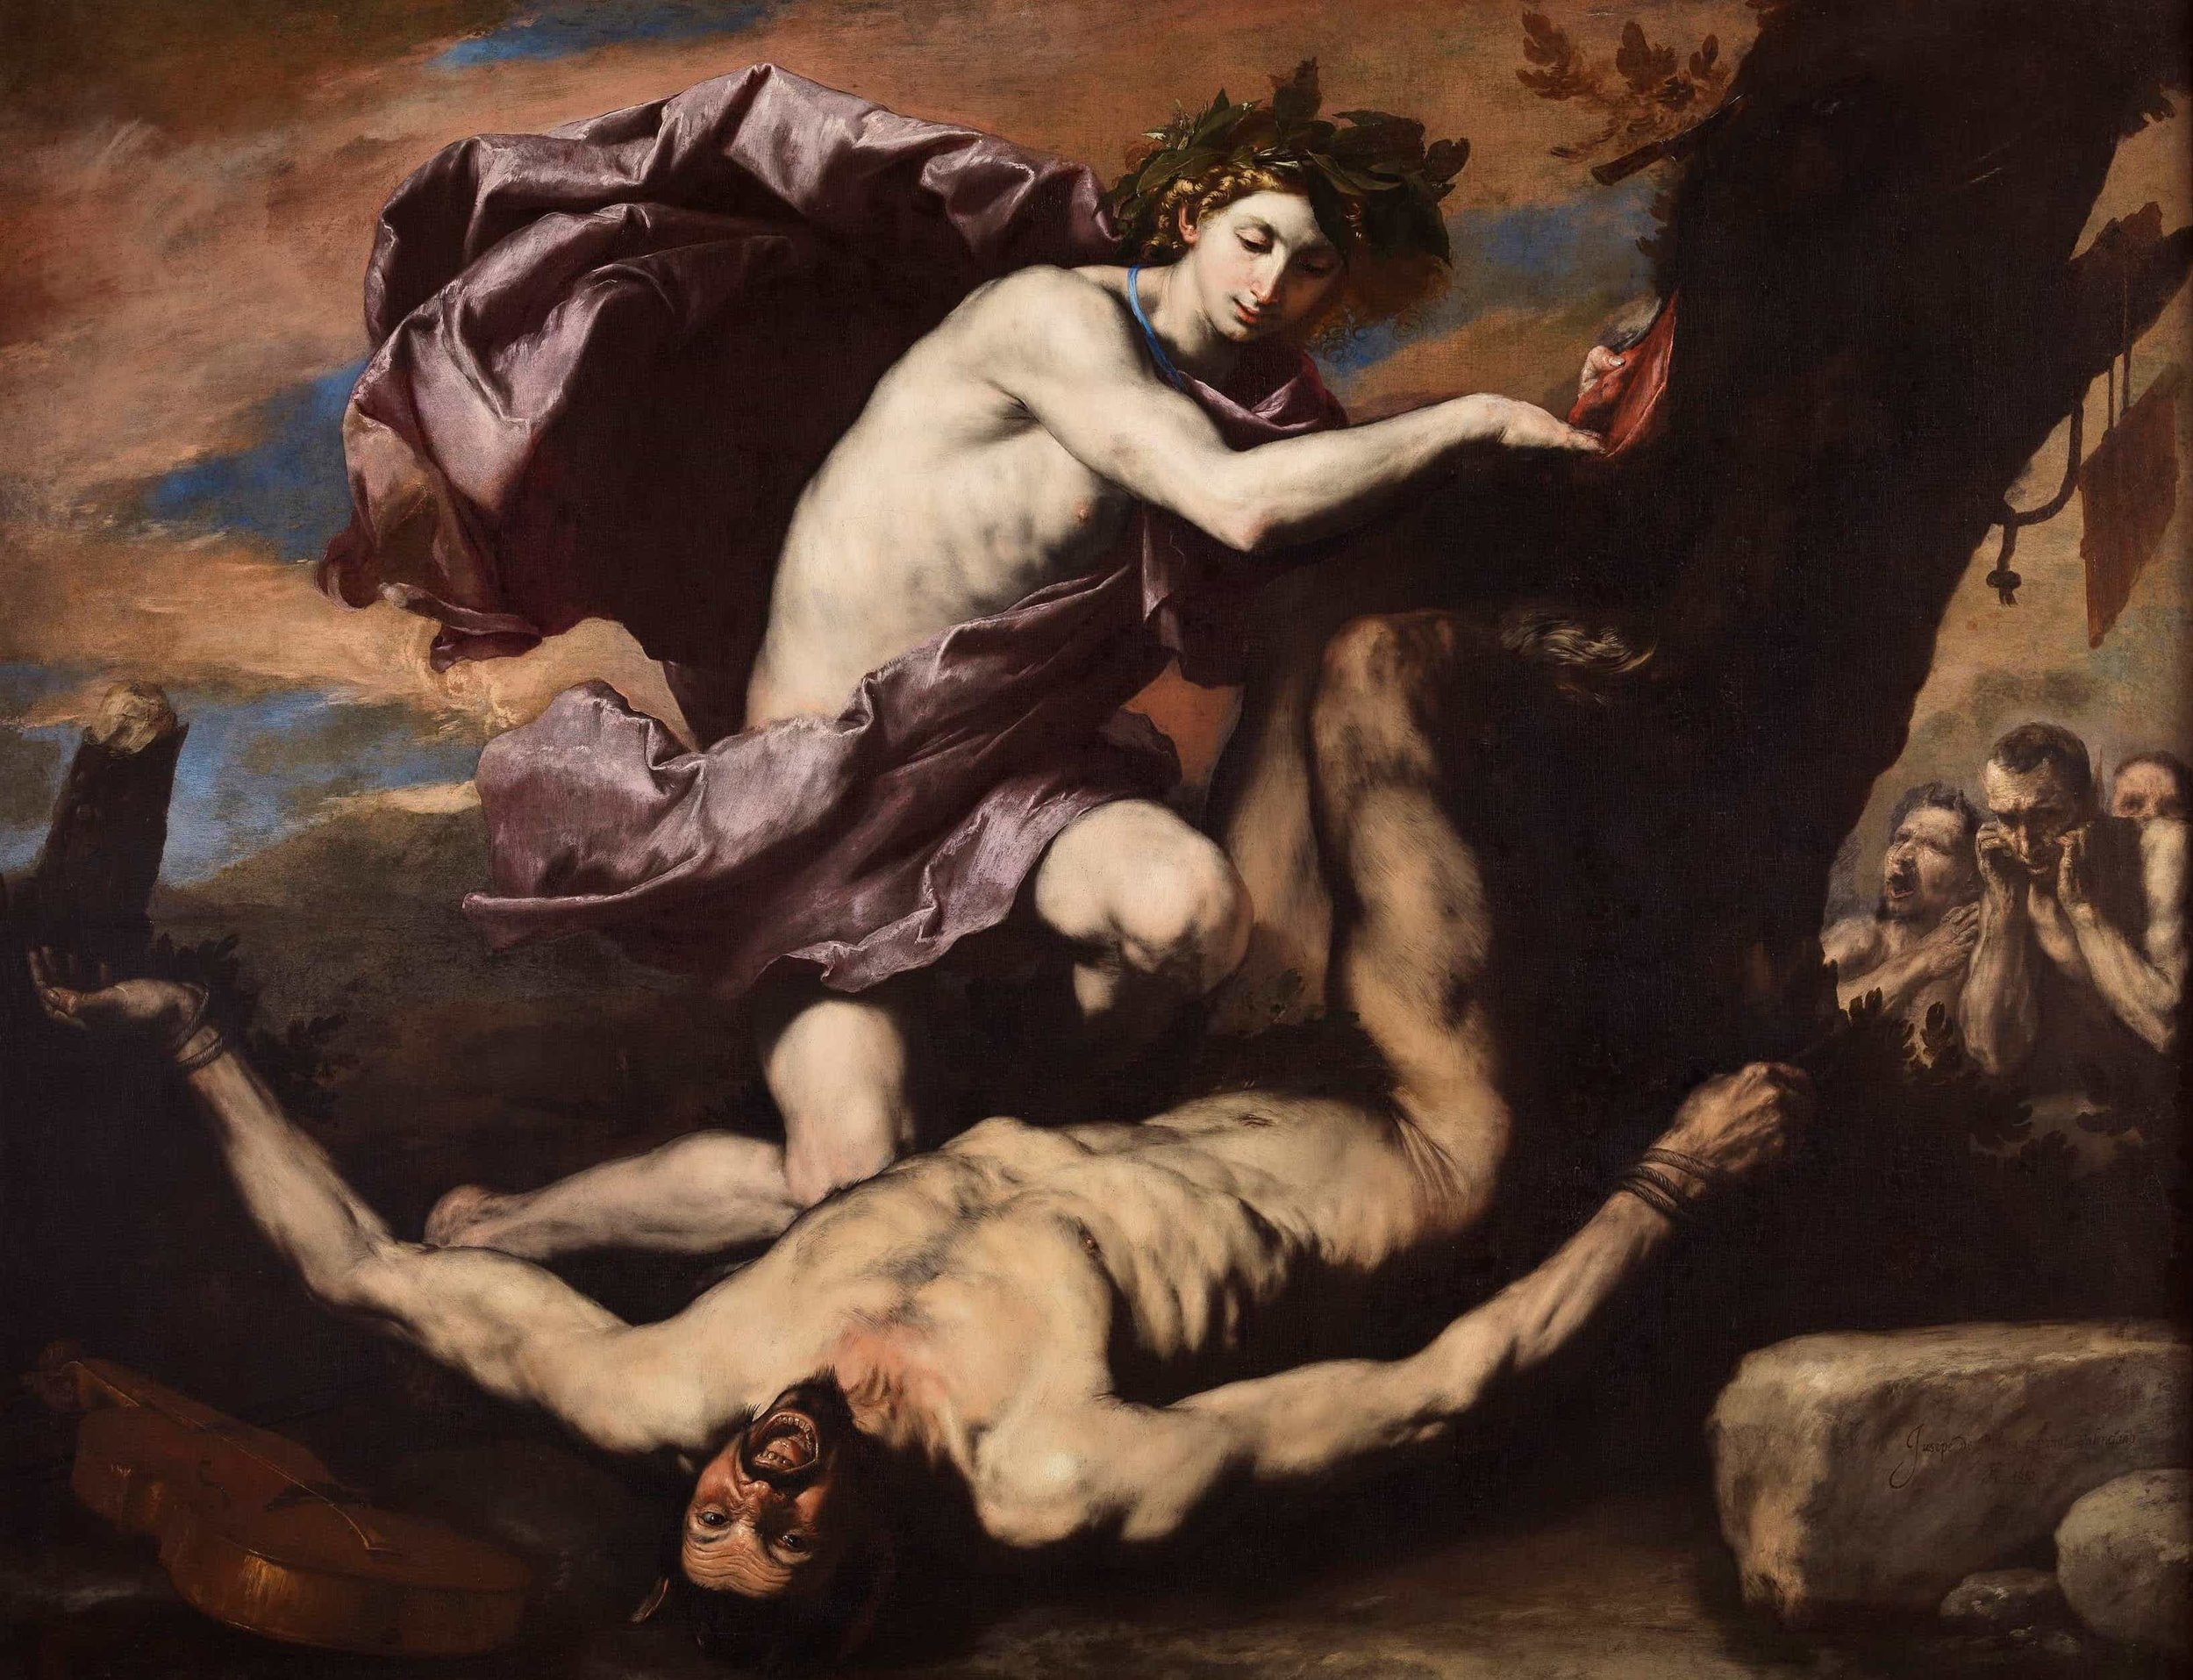 Jusepe de Ribera, Apollo and Marsyus (1637)